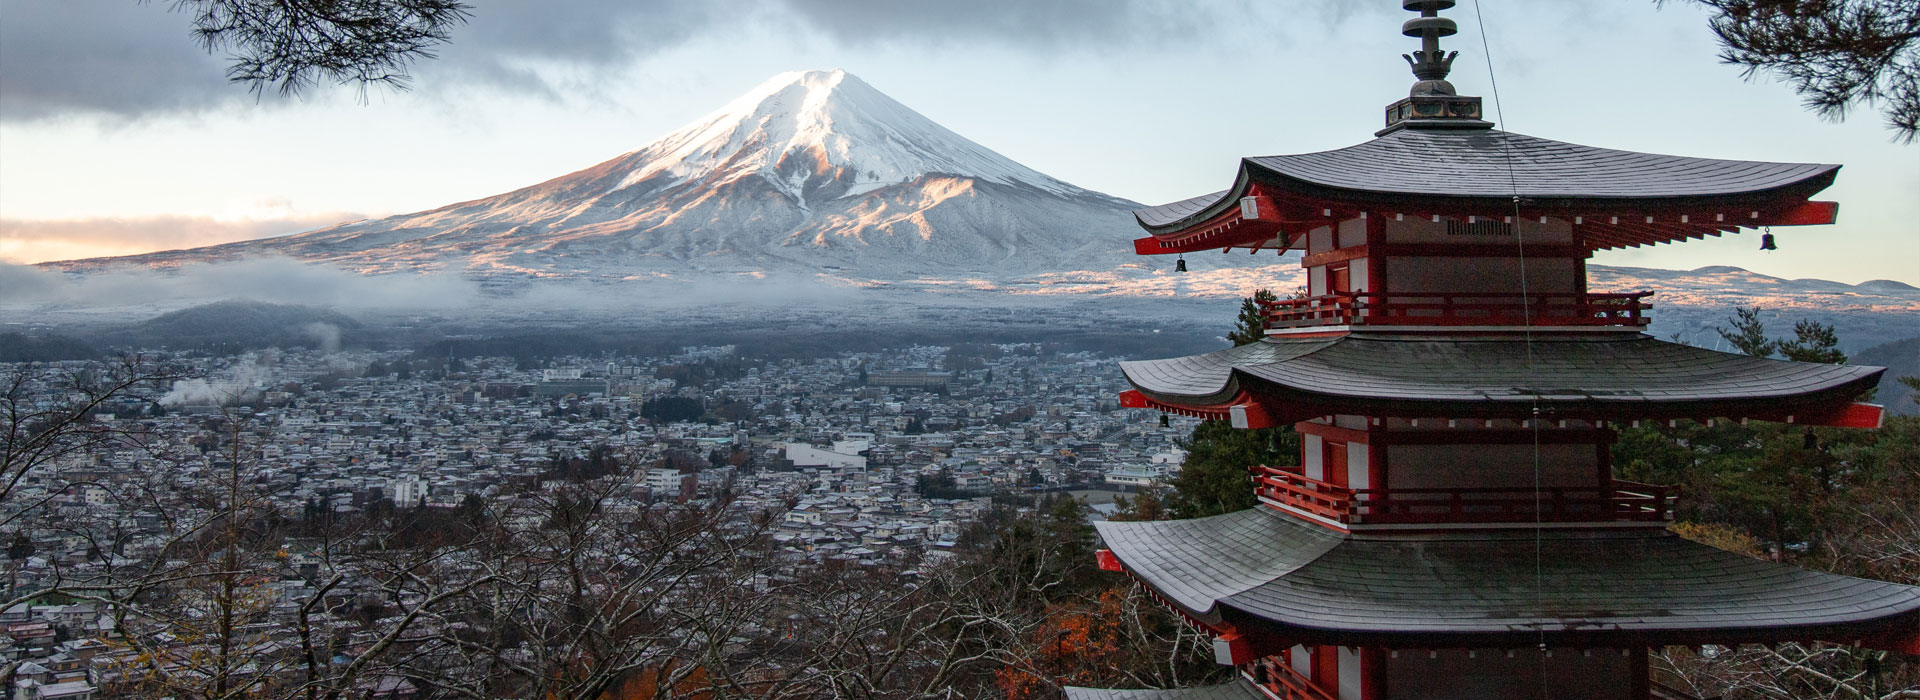 Japan: Religious Studies